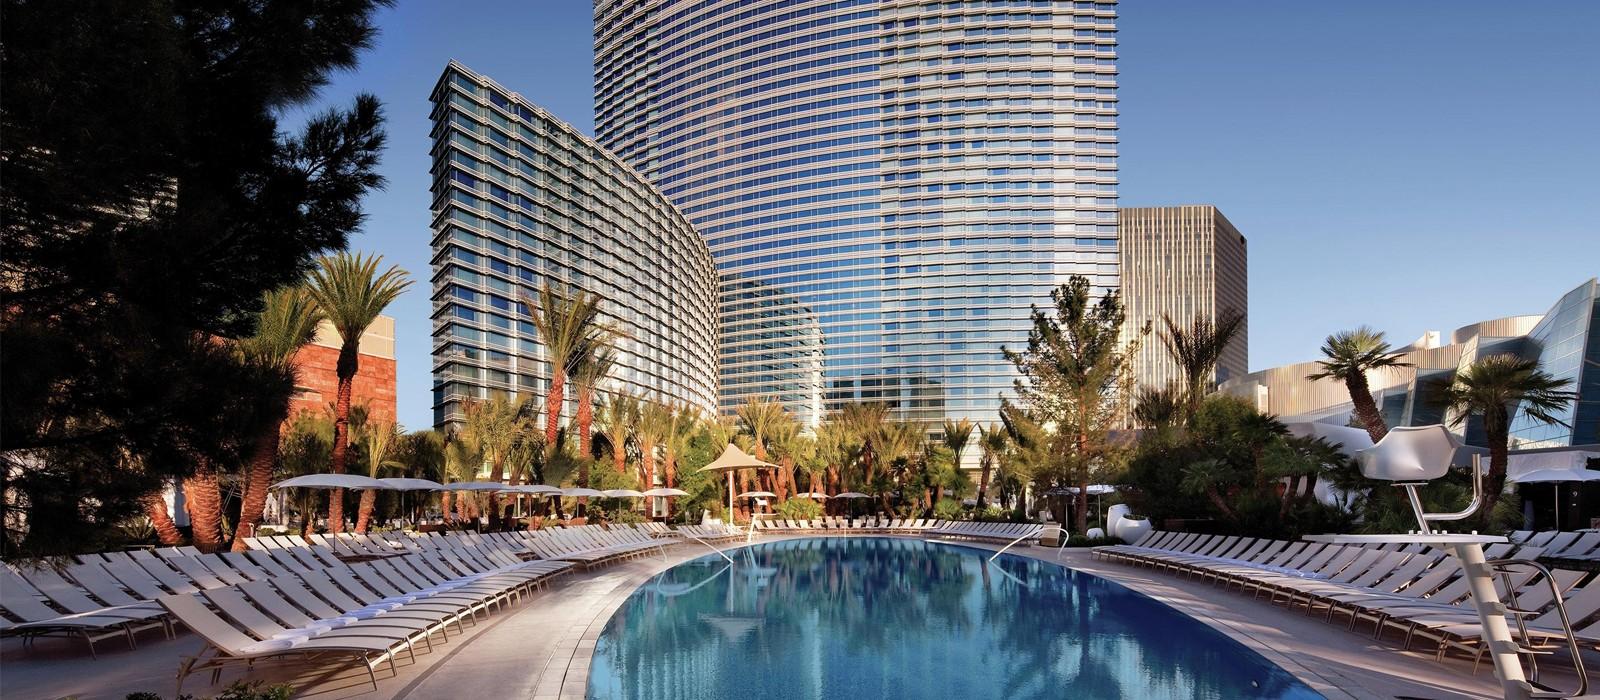 Las Vegas holidays - Aria Resort and Casino - Header